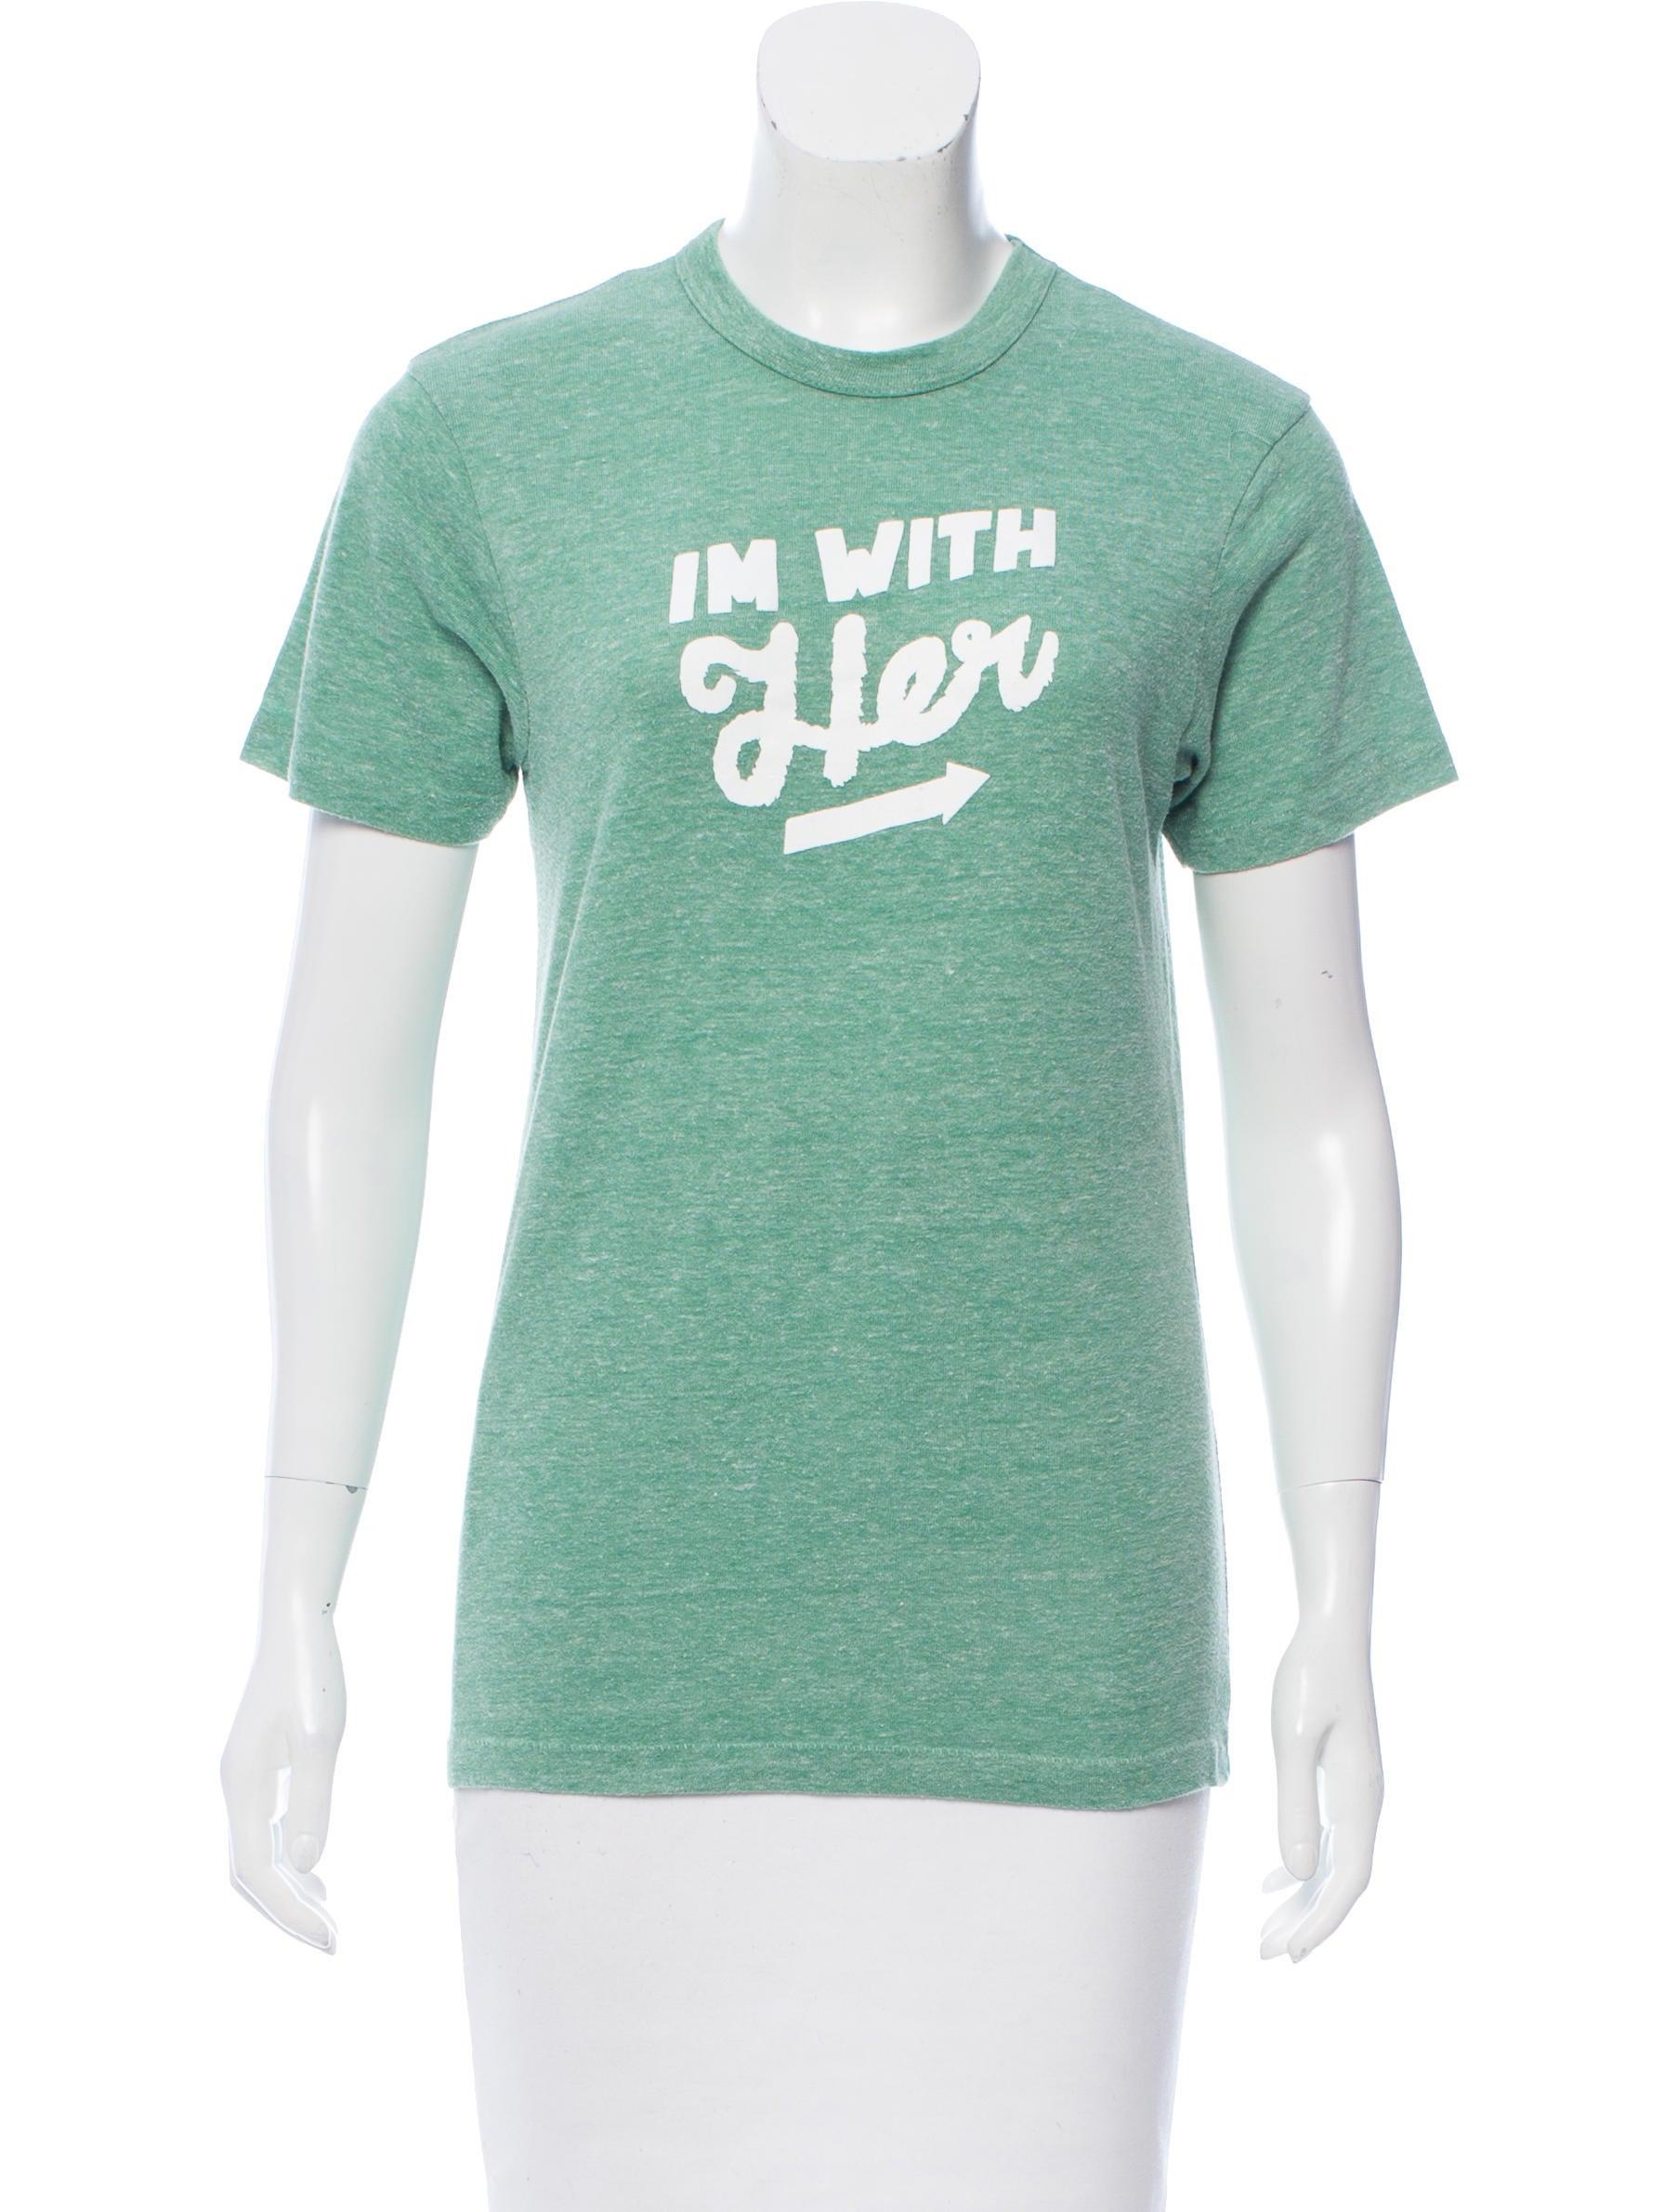 Top m lange graphic print t shirt clothing trtop20022 for T shirt graphic printing